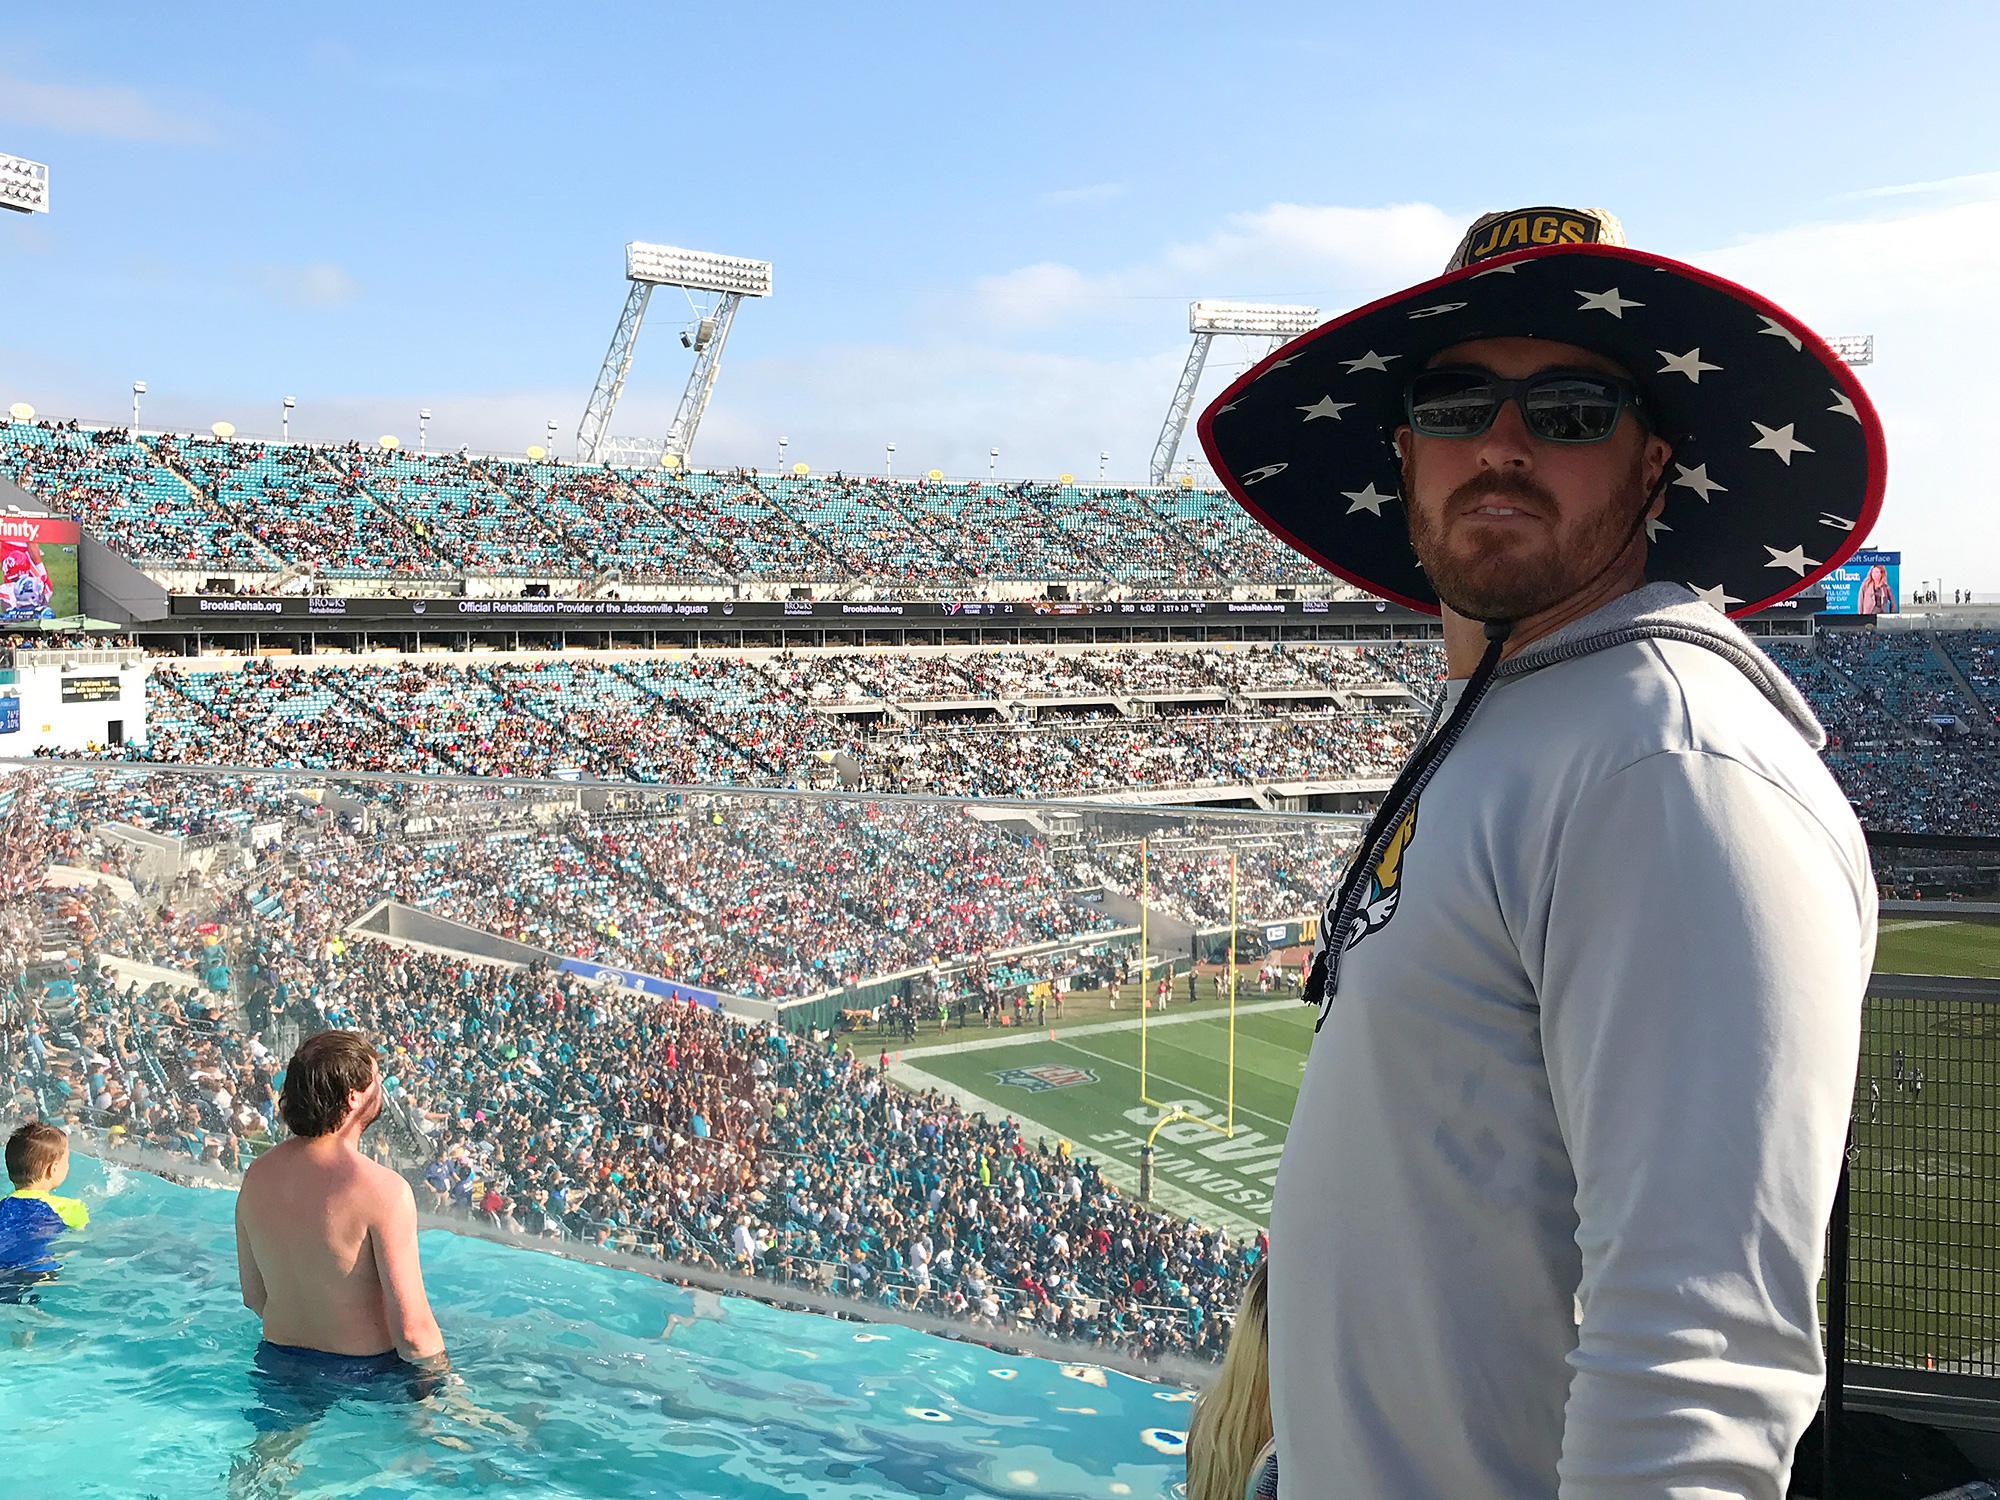 Nfl odd jobs selfies bikinis football hanging by the - Jacksonville jaguars swimming pool ...